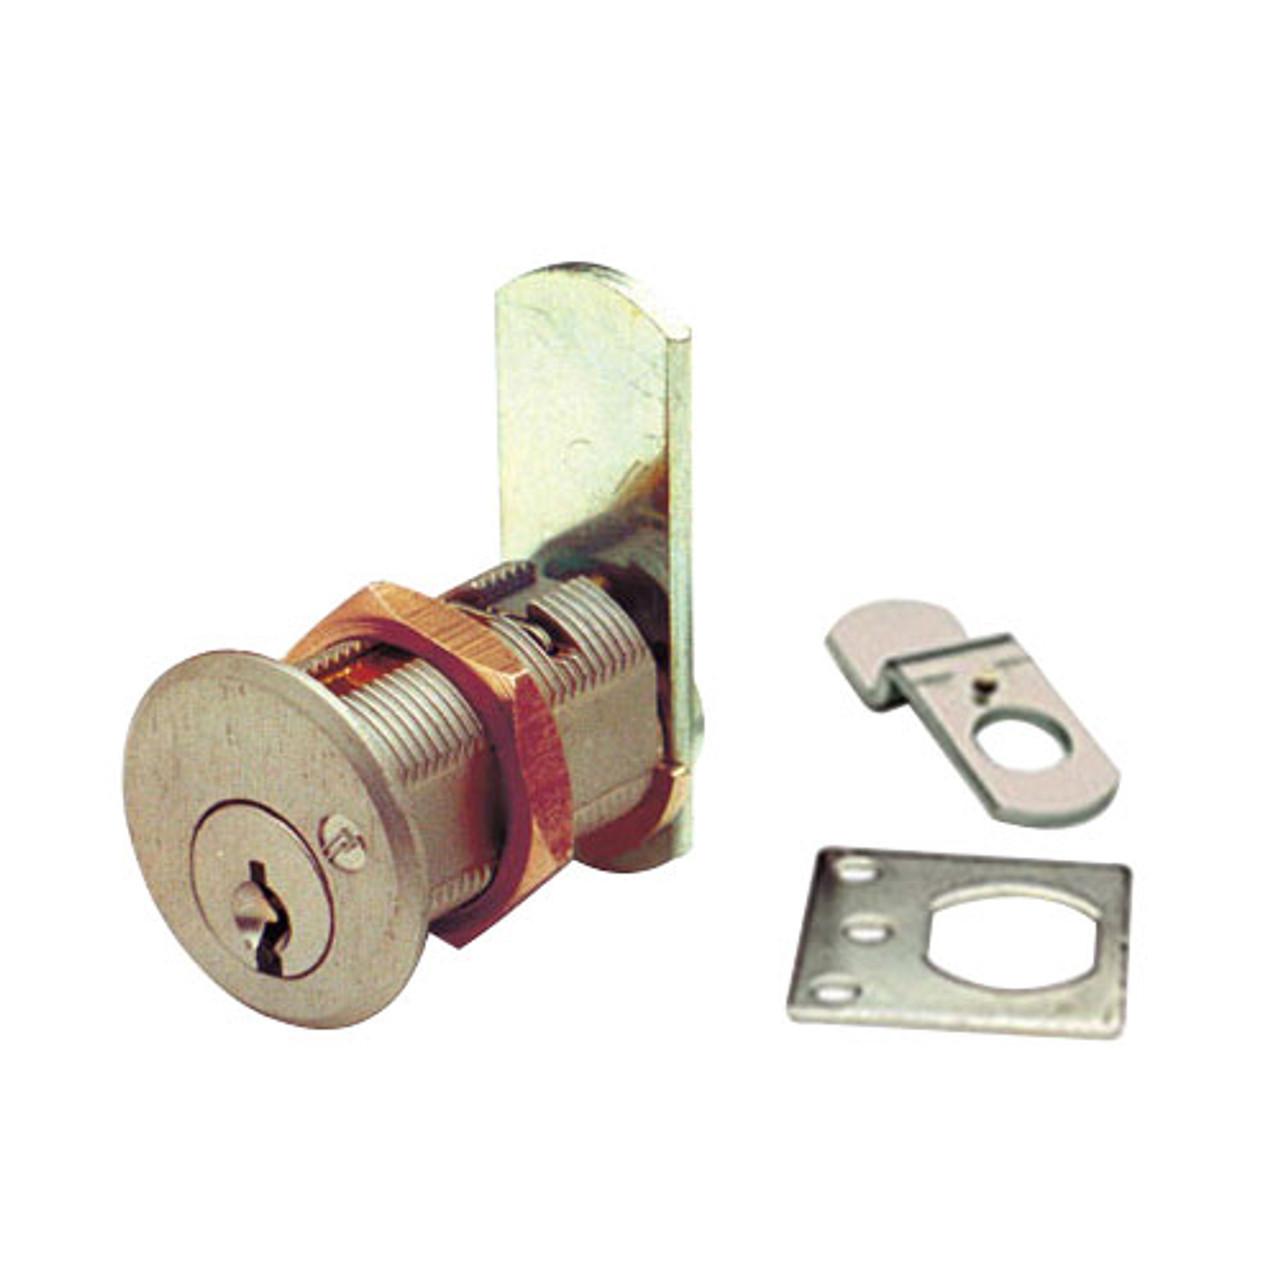 Olympus DCN4-KD-US3 Cam Locks in Bright Brass Finish